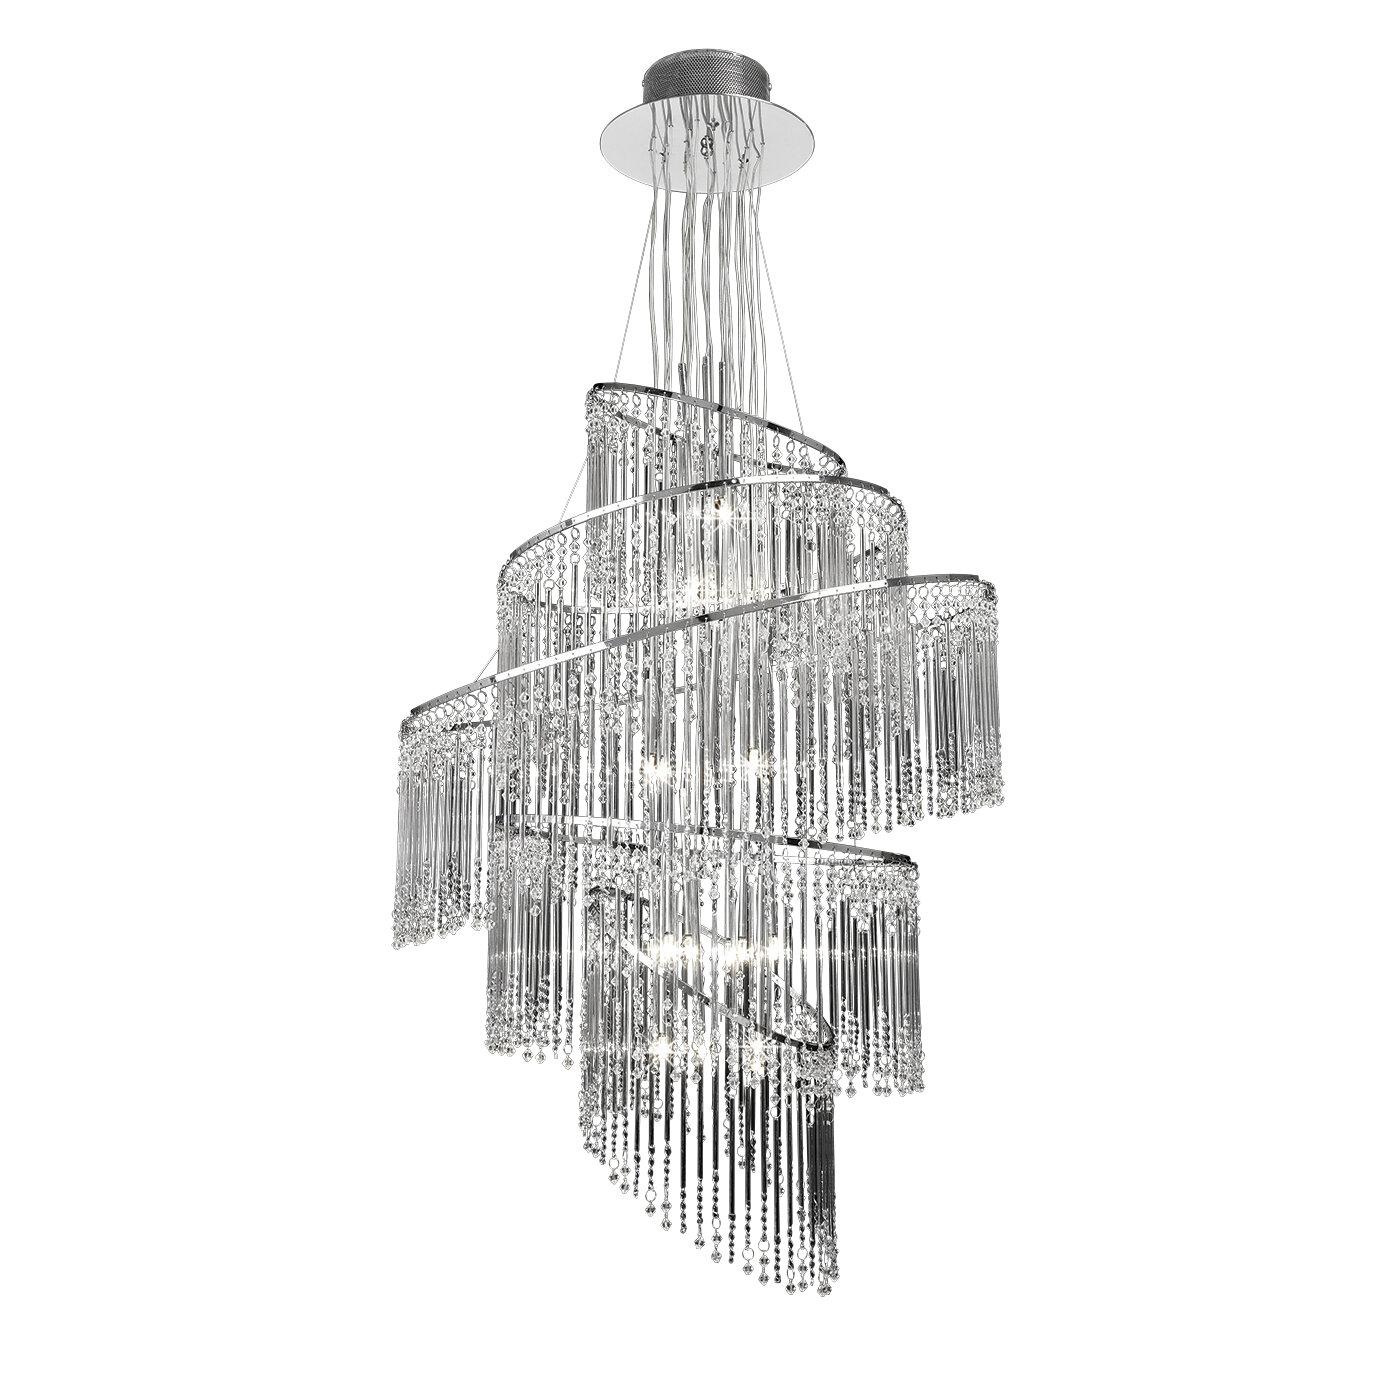 Endon lighting 24 light crystal chandelier reviews wayfair arubaitofo Gallery